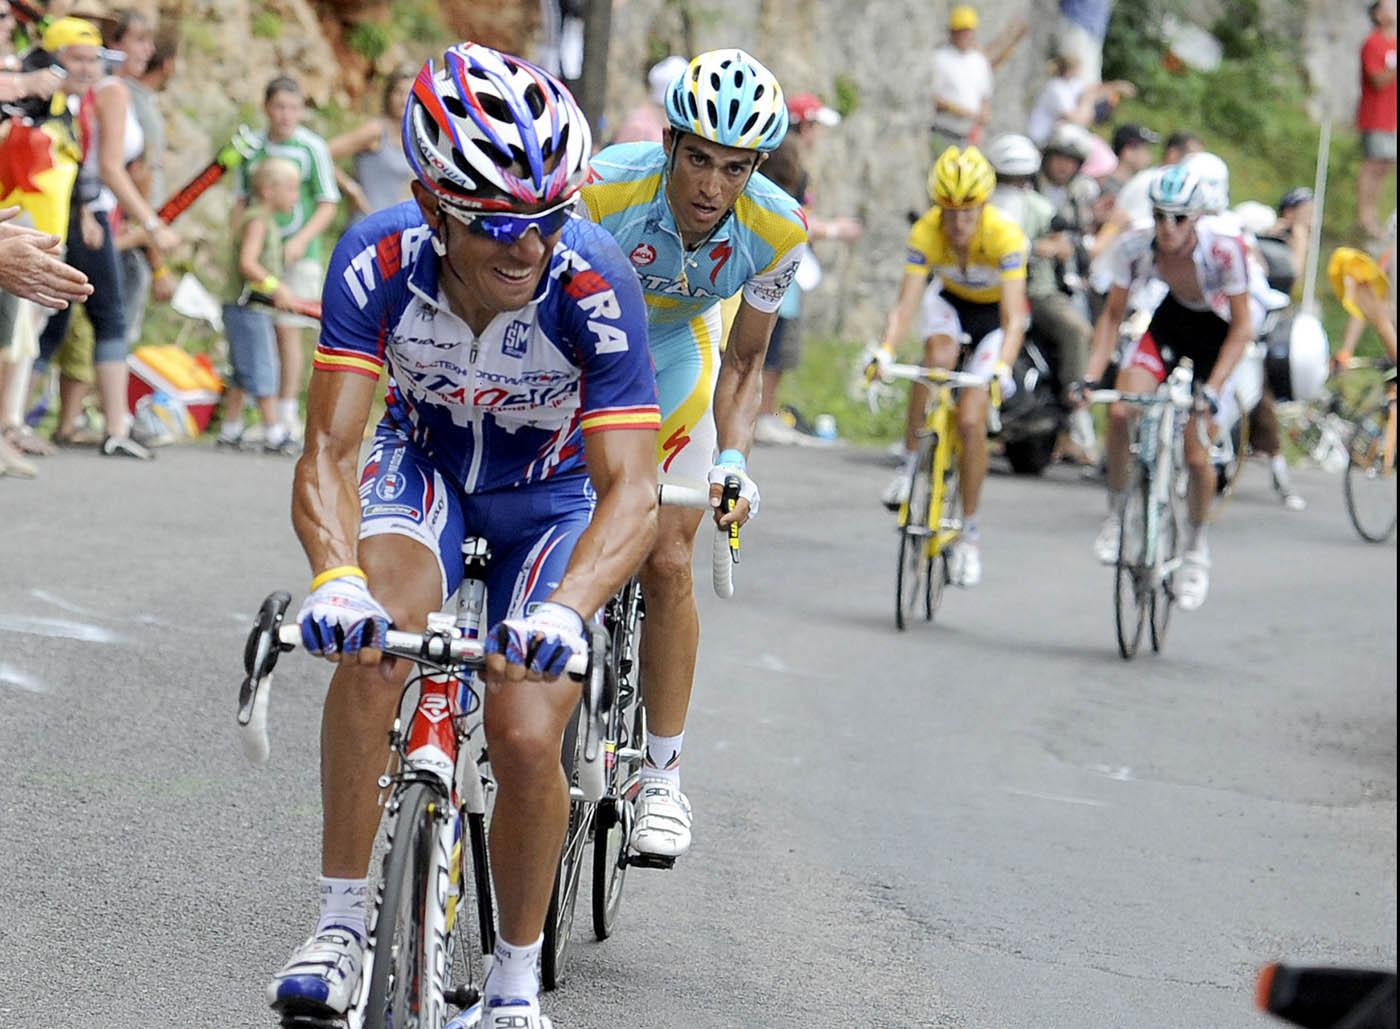 Joaquin Rodriguez attacks, Tour de France 2010, stage 12